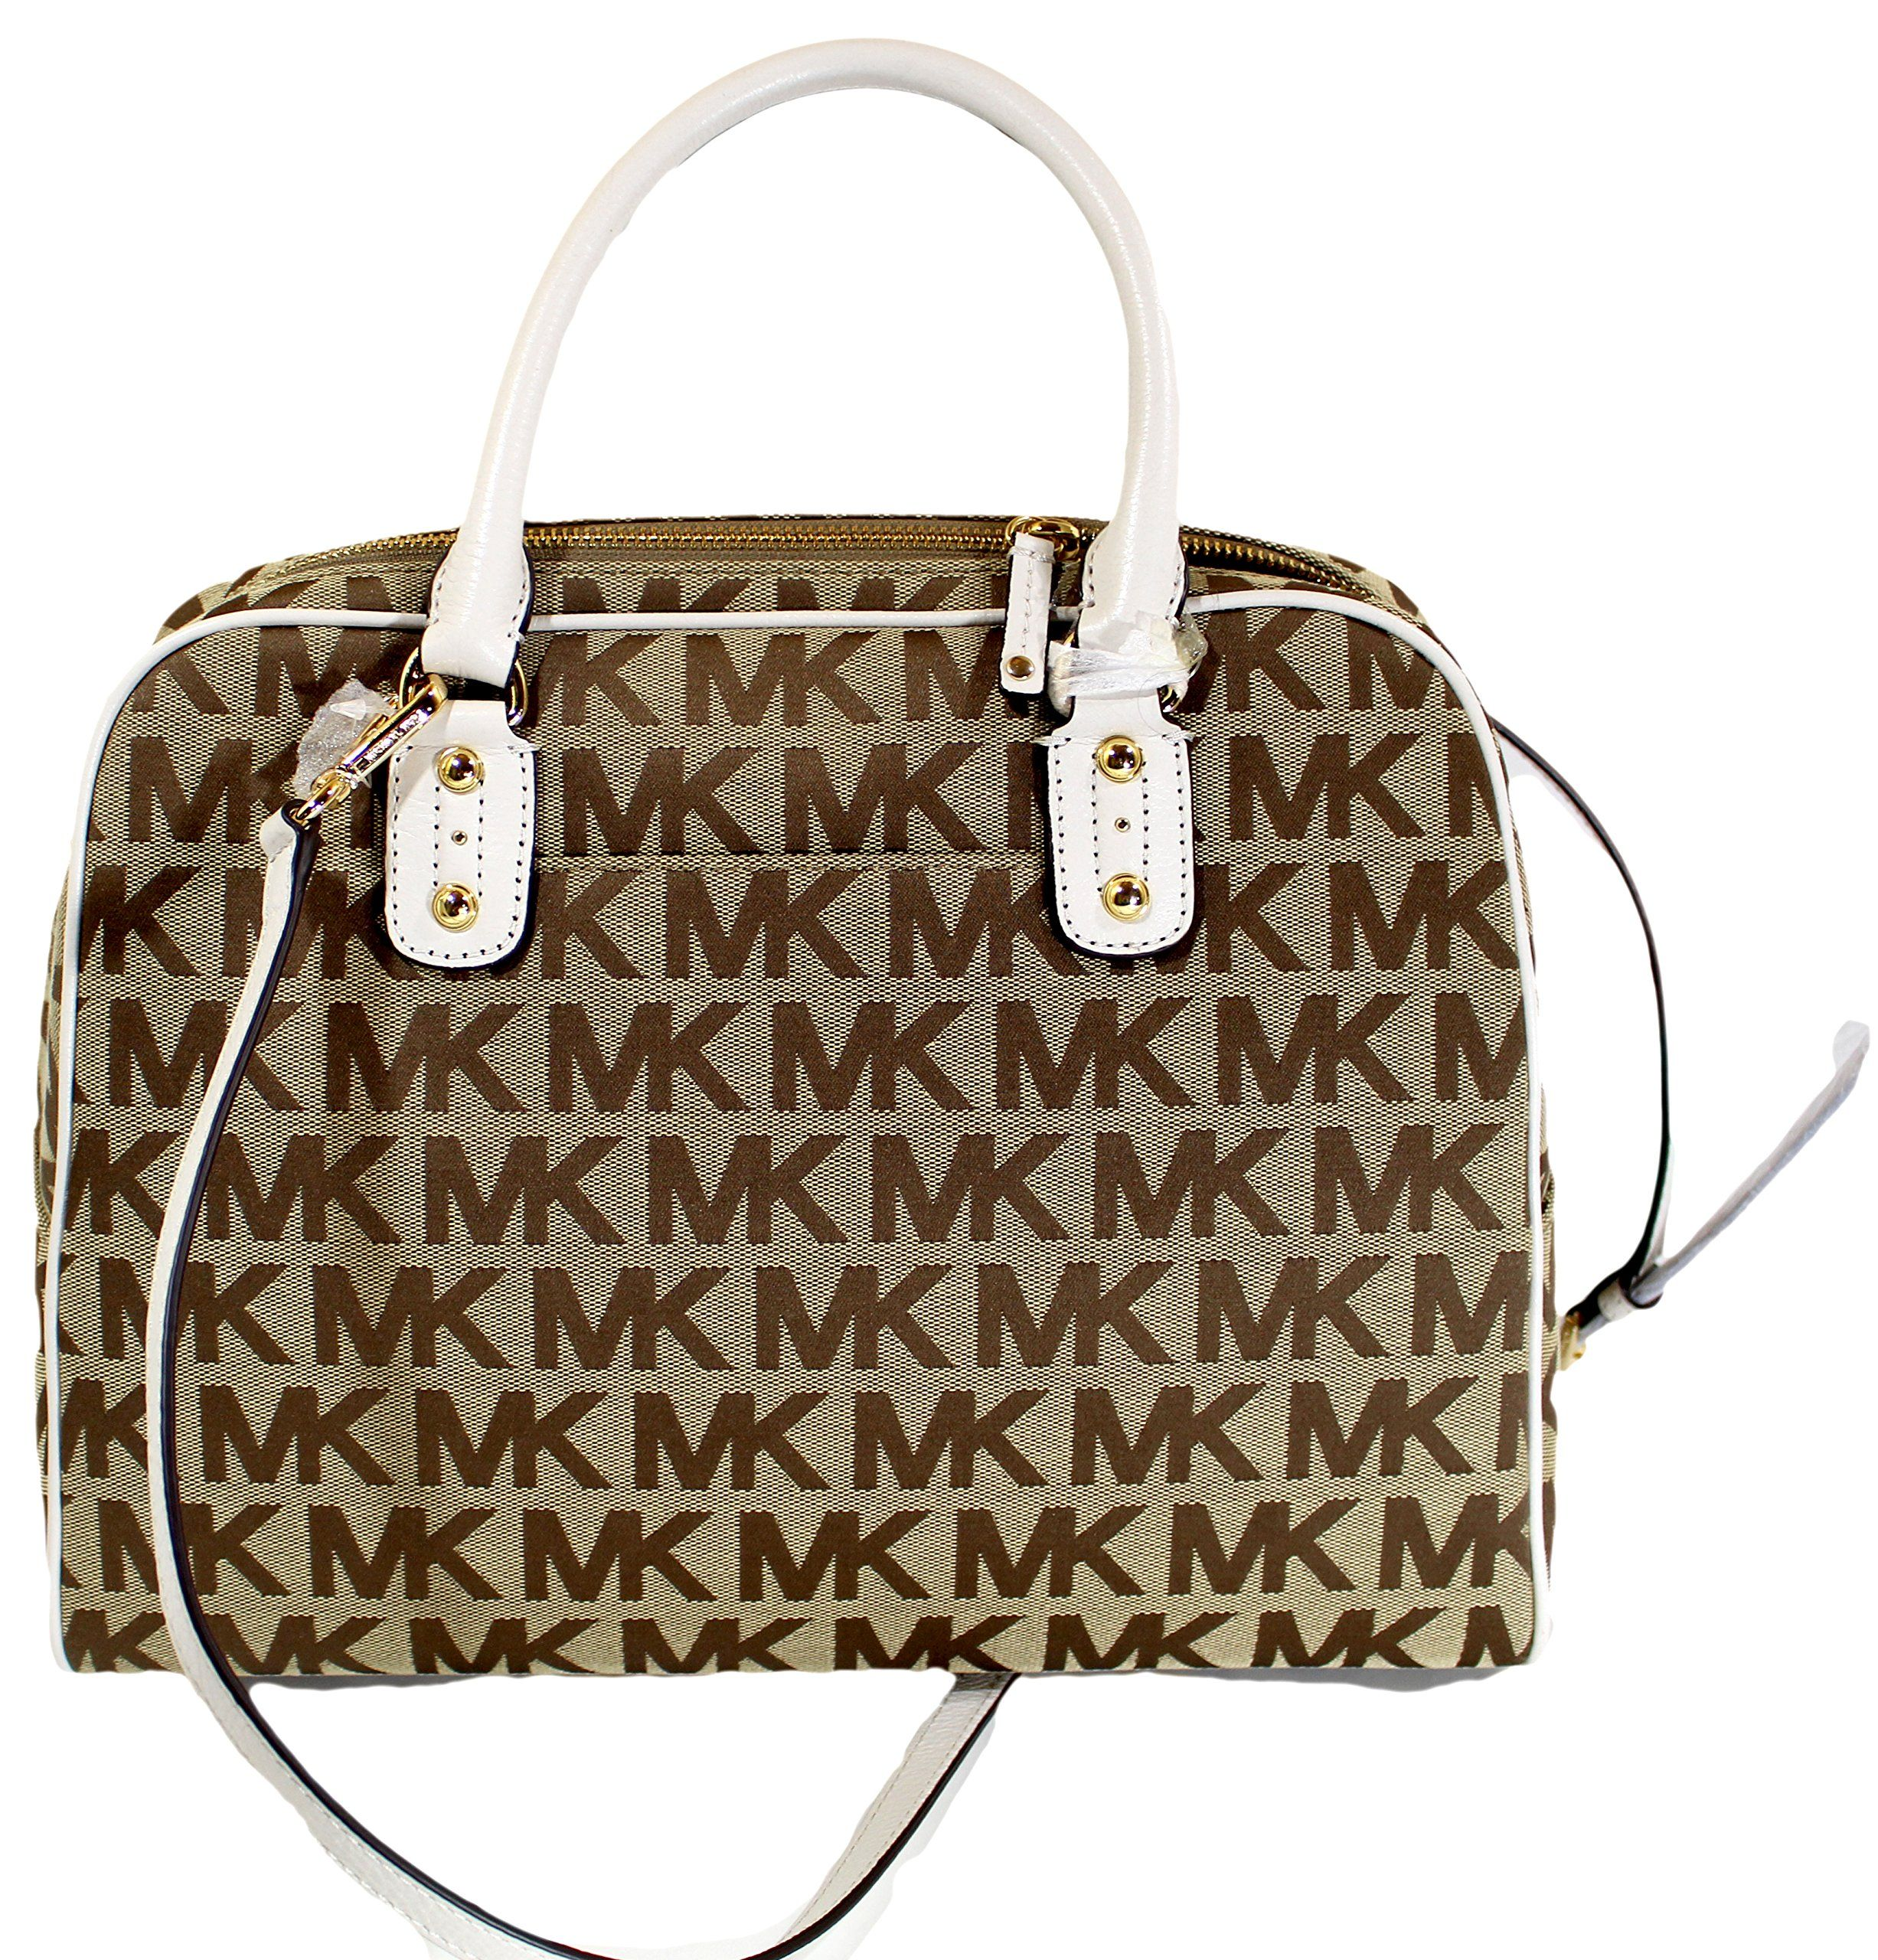 97c7f28a7c75d0 Michael Kors MK Signature JACQUARD LG Satchel Handbag Shoulder Purse Bag --  You can get additional details at the image link. (This is an affiliate  link) # ...